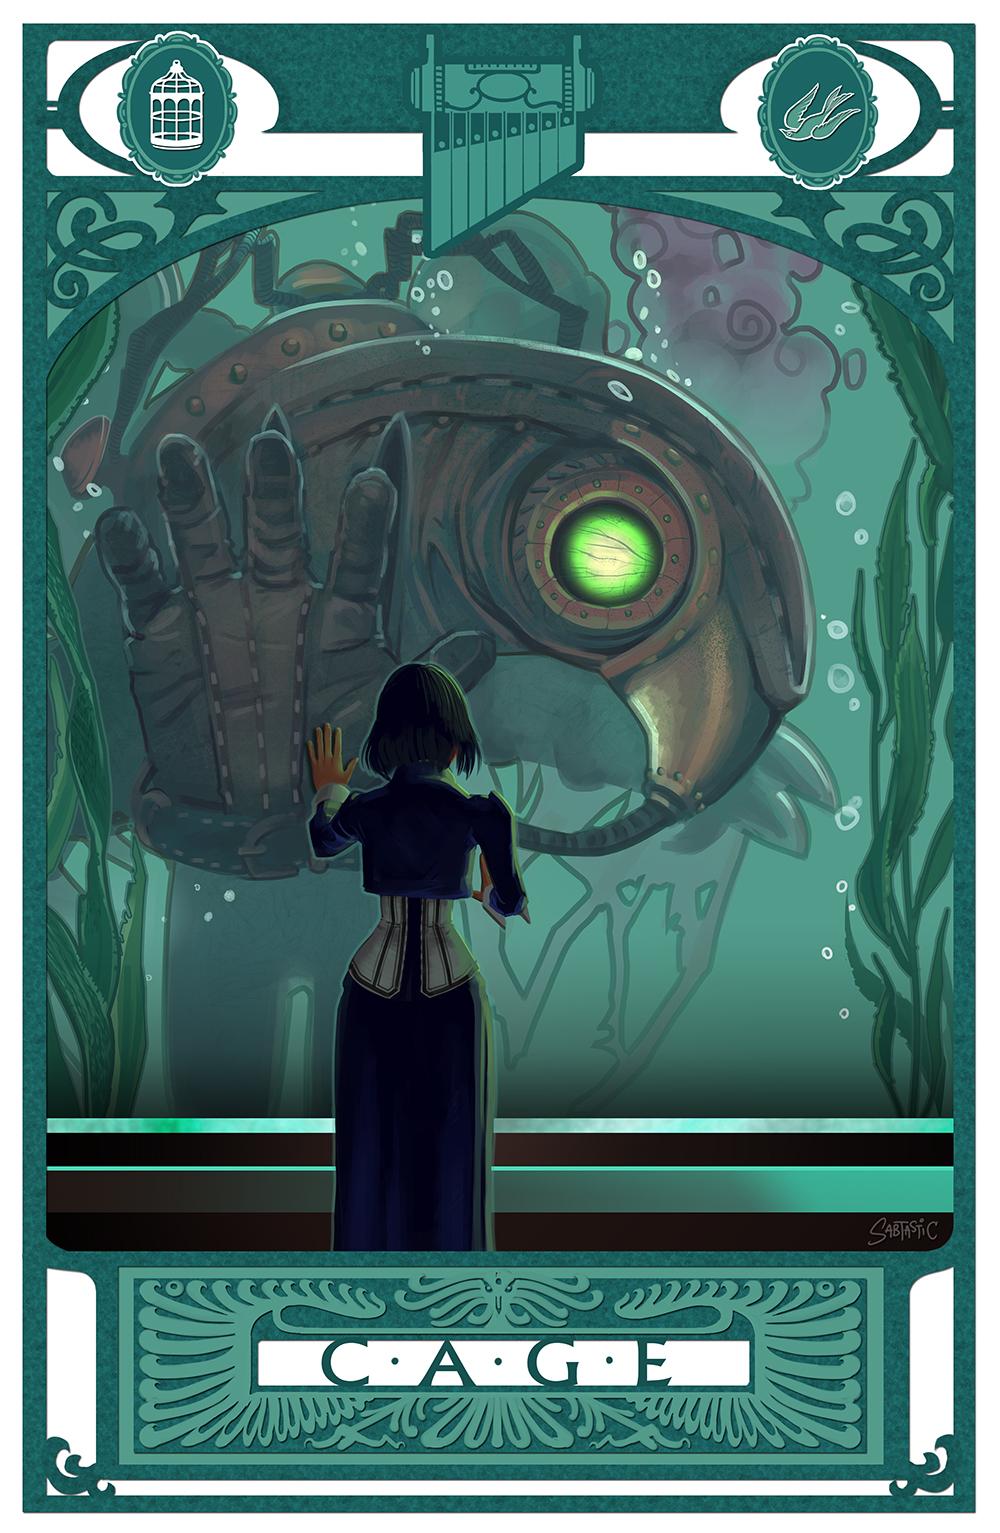 Bioshock Infinite: C-A-G-E